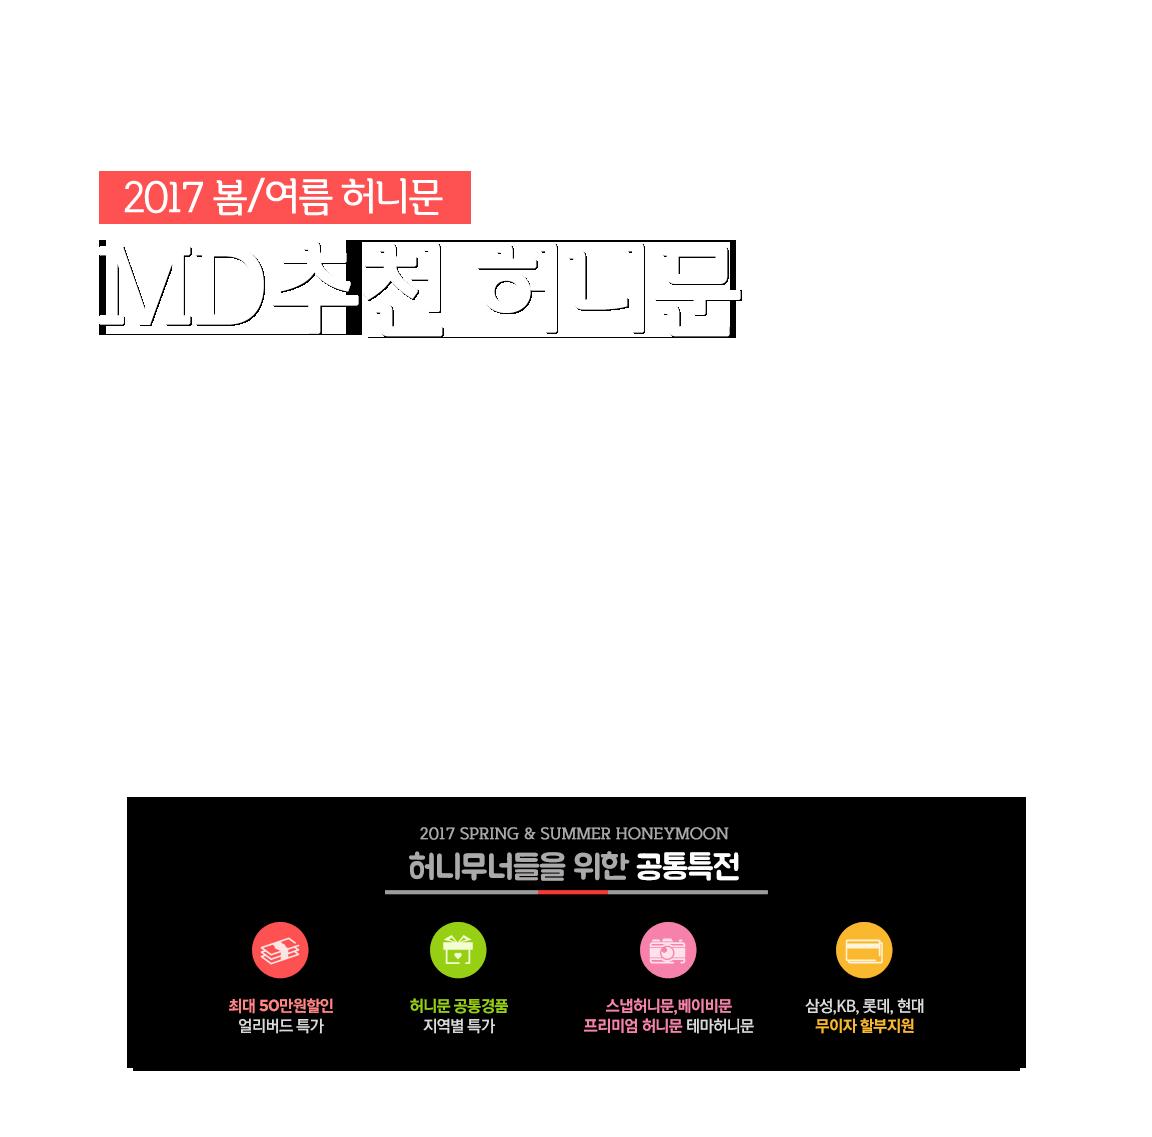 2017 ss허니문 얼리버드특가